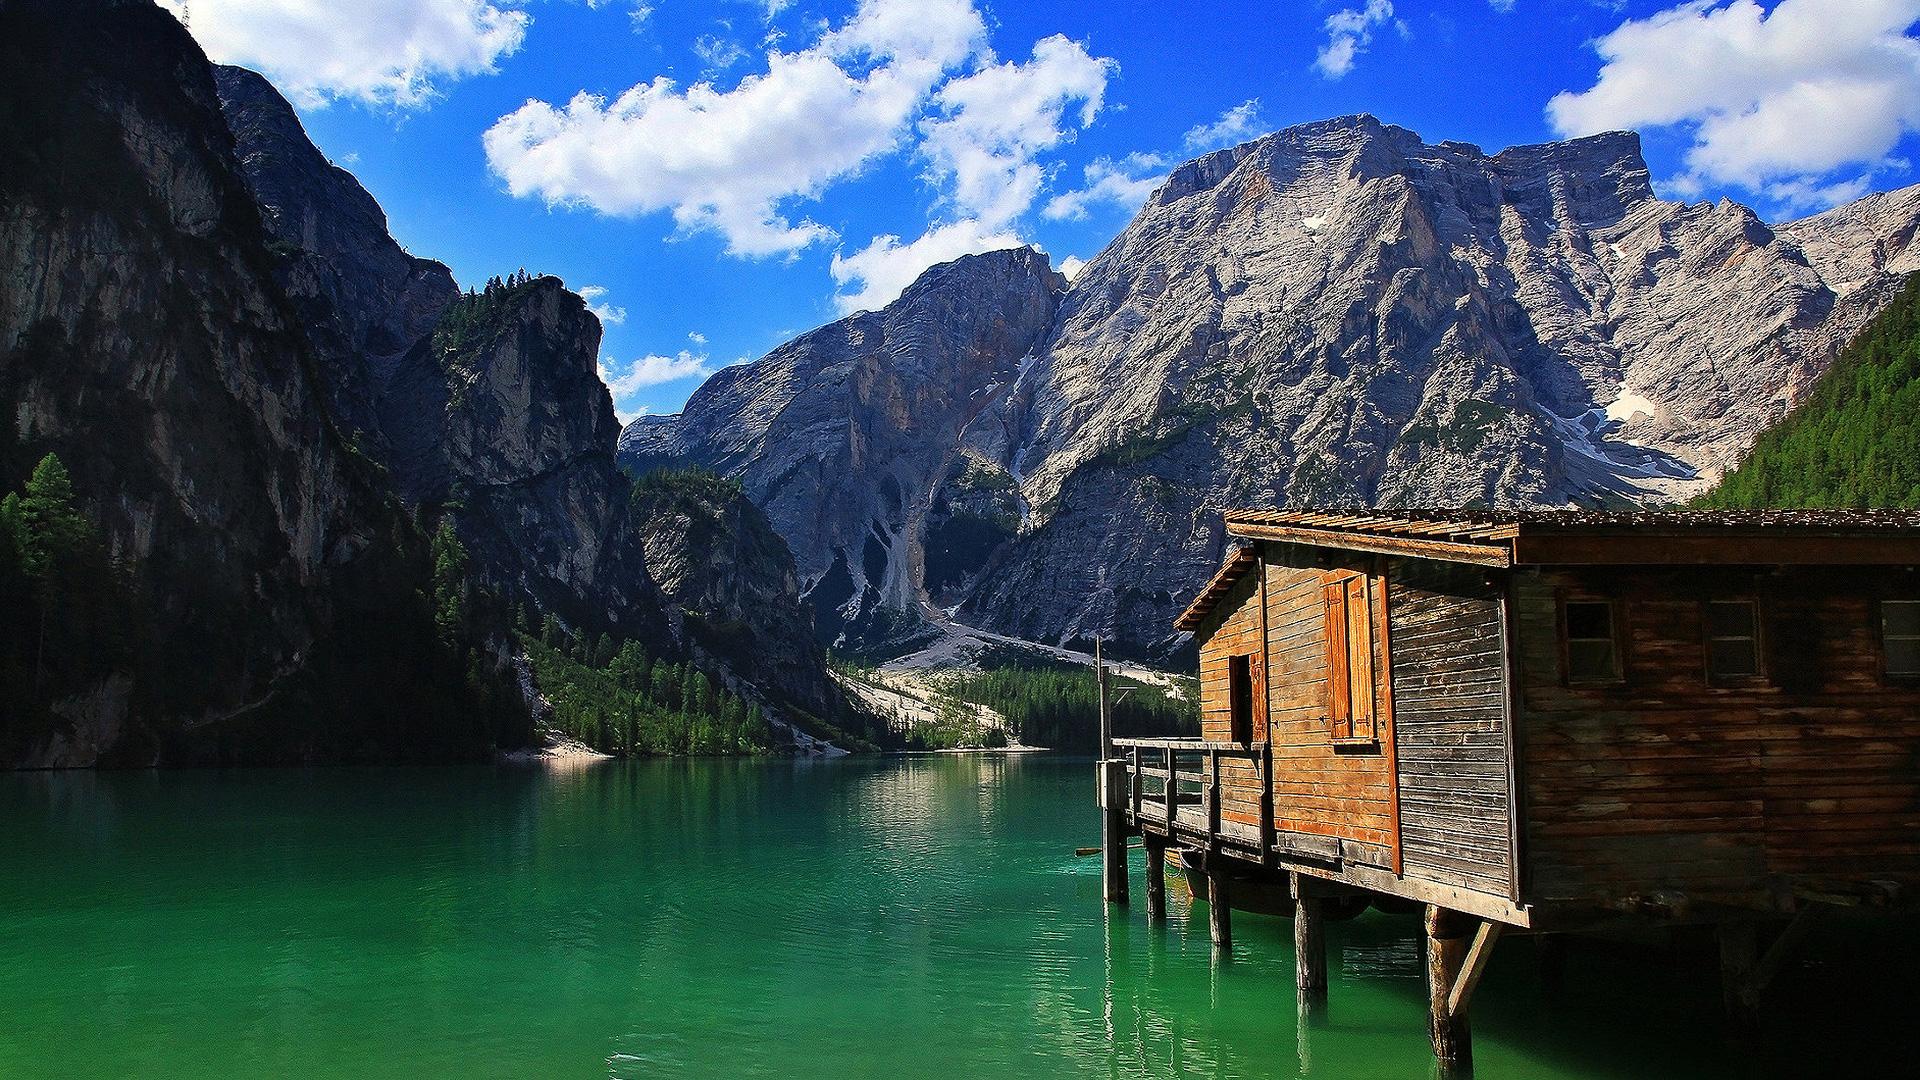 Stilt cabin on a mountain lake wallpaper   747350 1920x1080